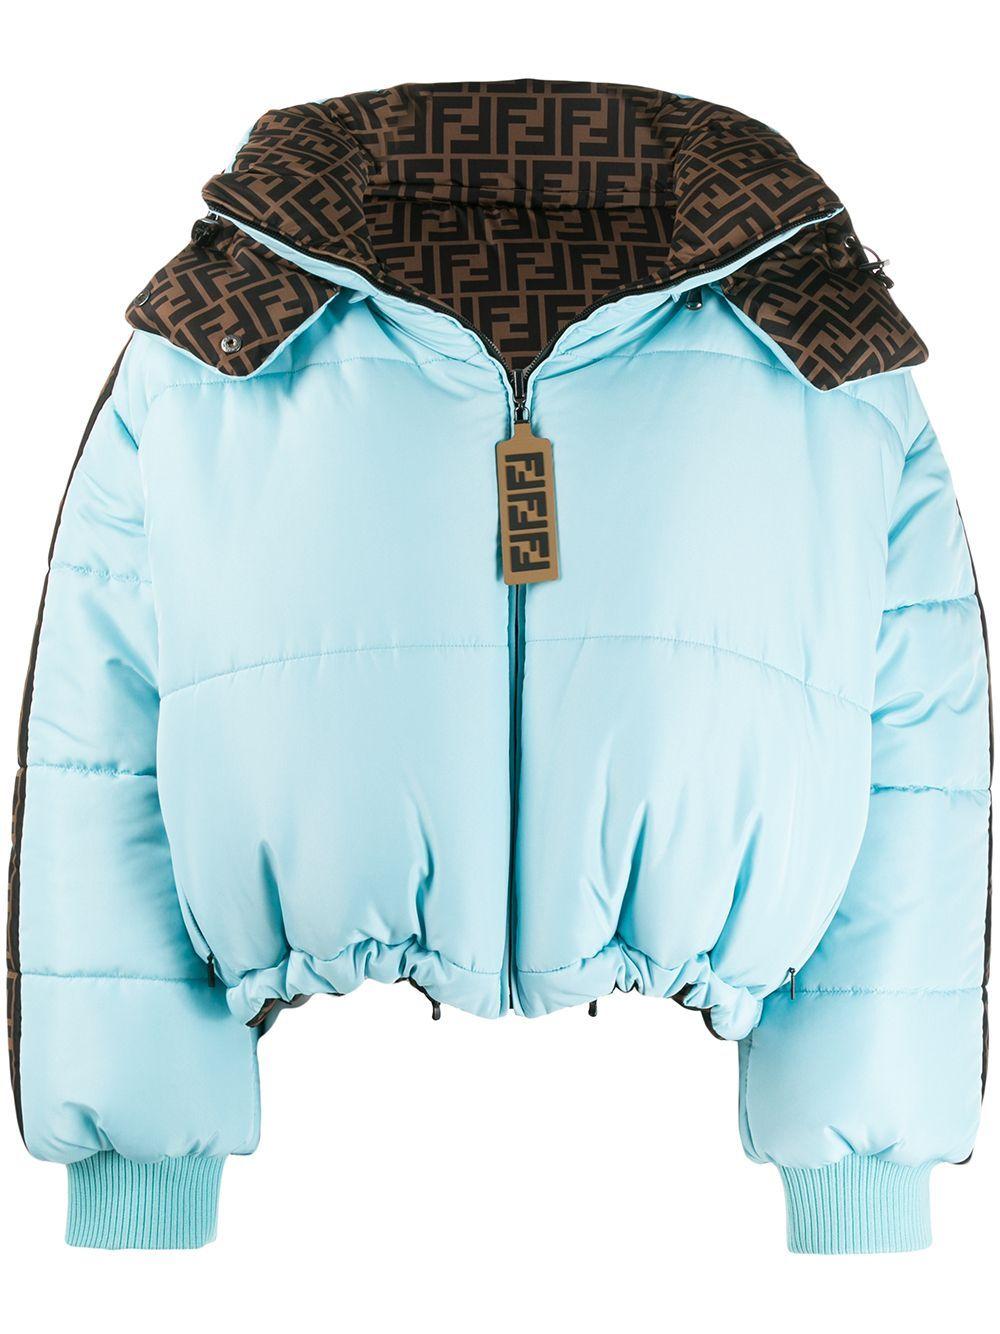 Fendi Ff Logo Reversible Puffer Jacket Farfetch Clothes Fashion Fashion Inspo Outfits [ 1334 x 1000 Pixel ]